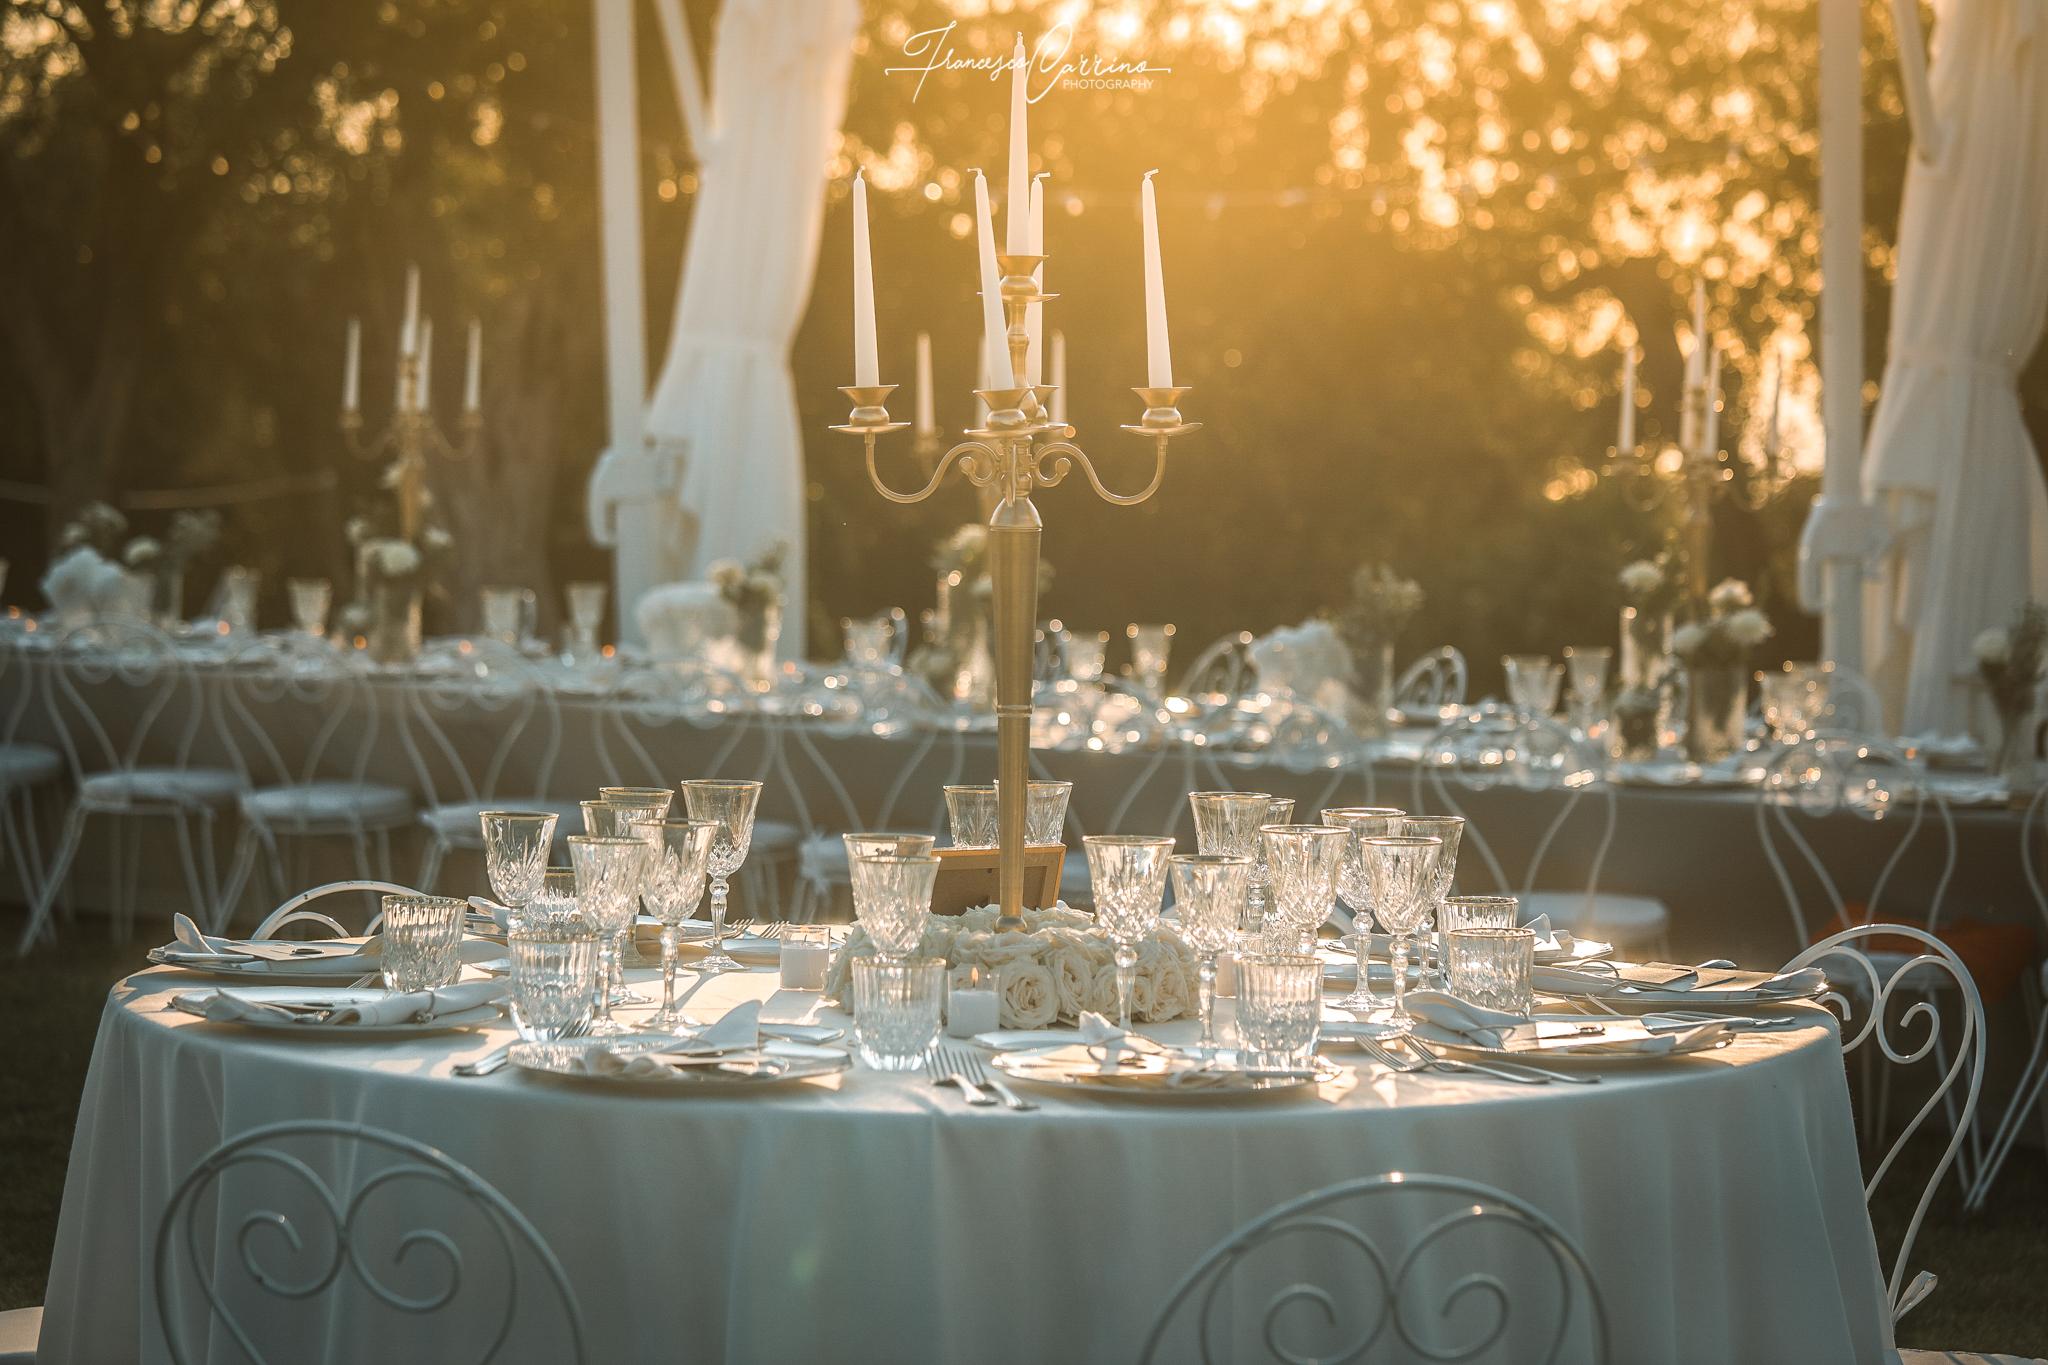 https://www.weddingamalfi.com/wp-content/uploads/Giannenza-13-luglio-2019-17.jpg